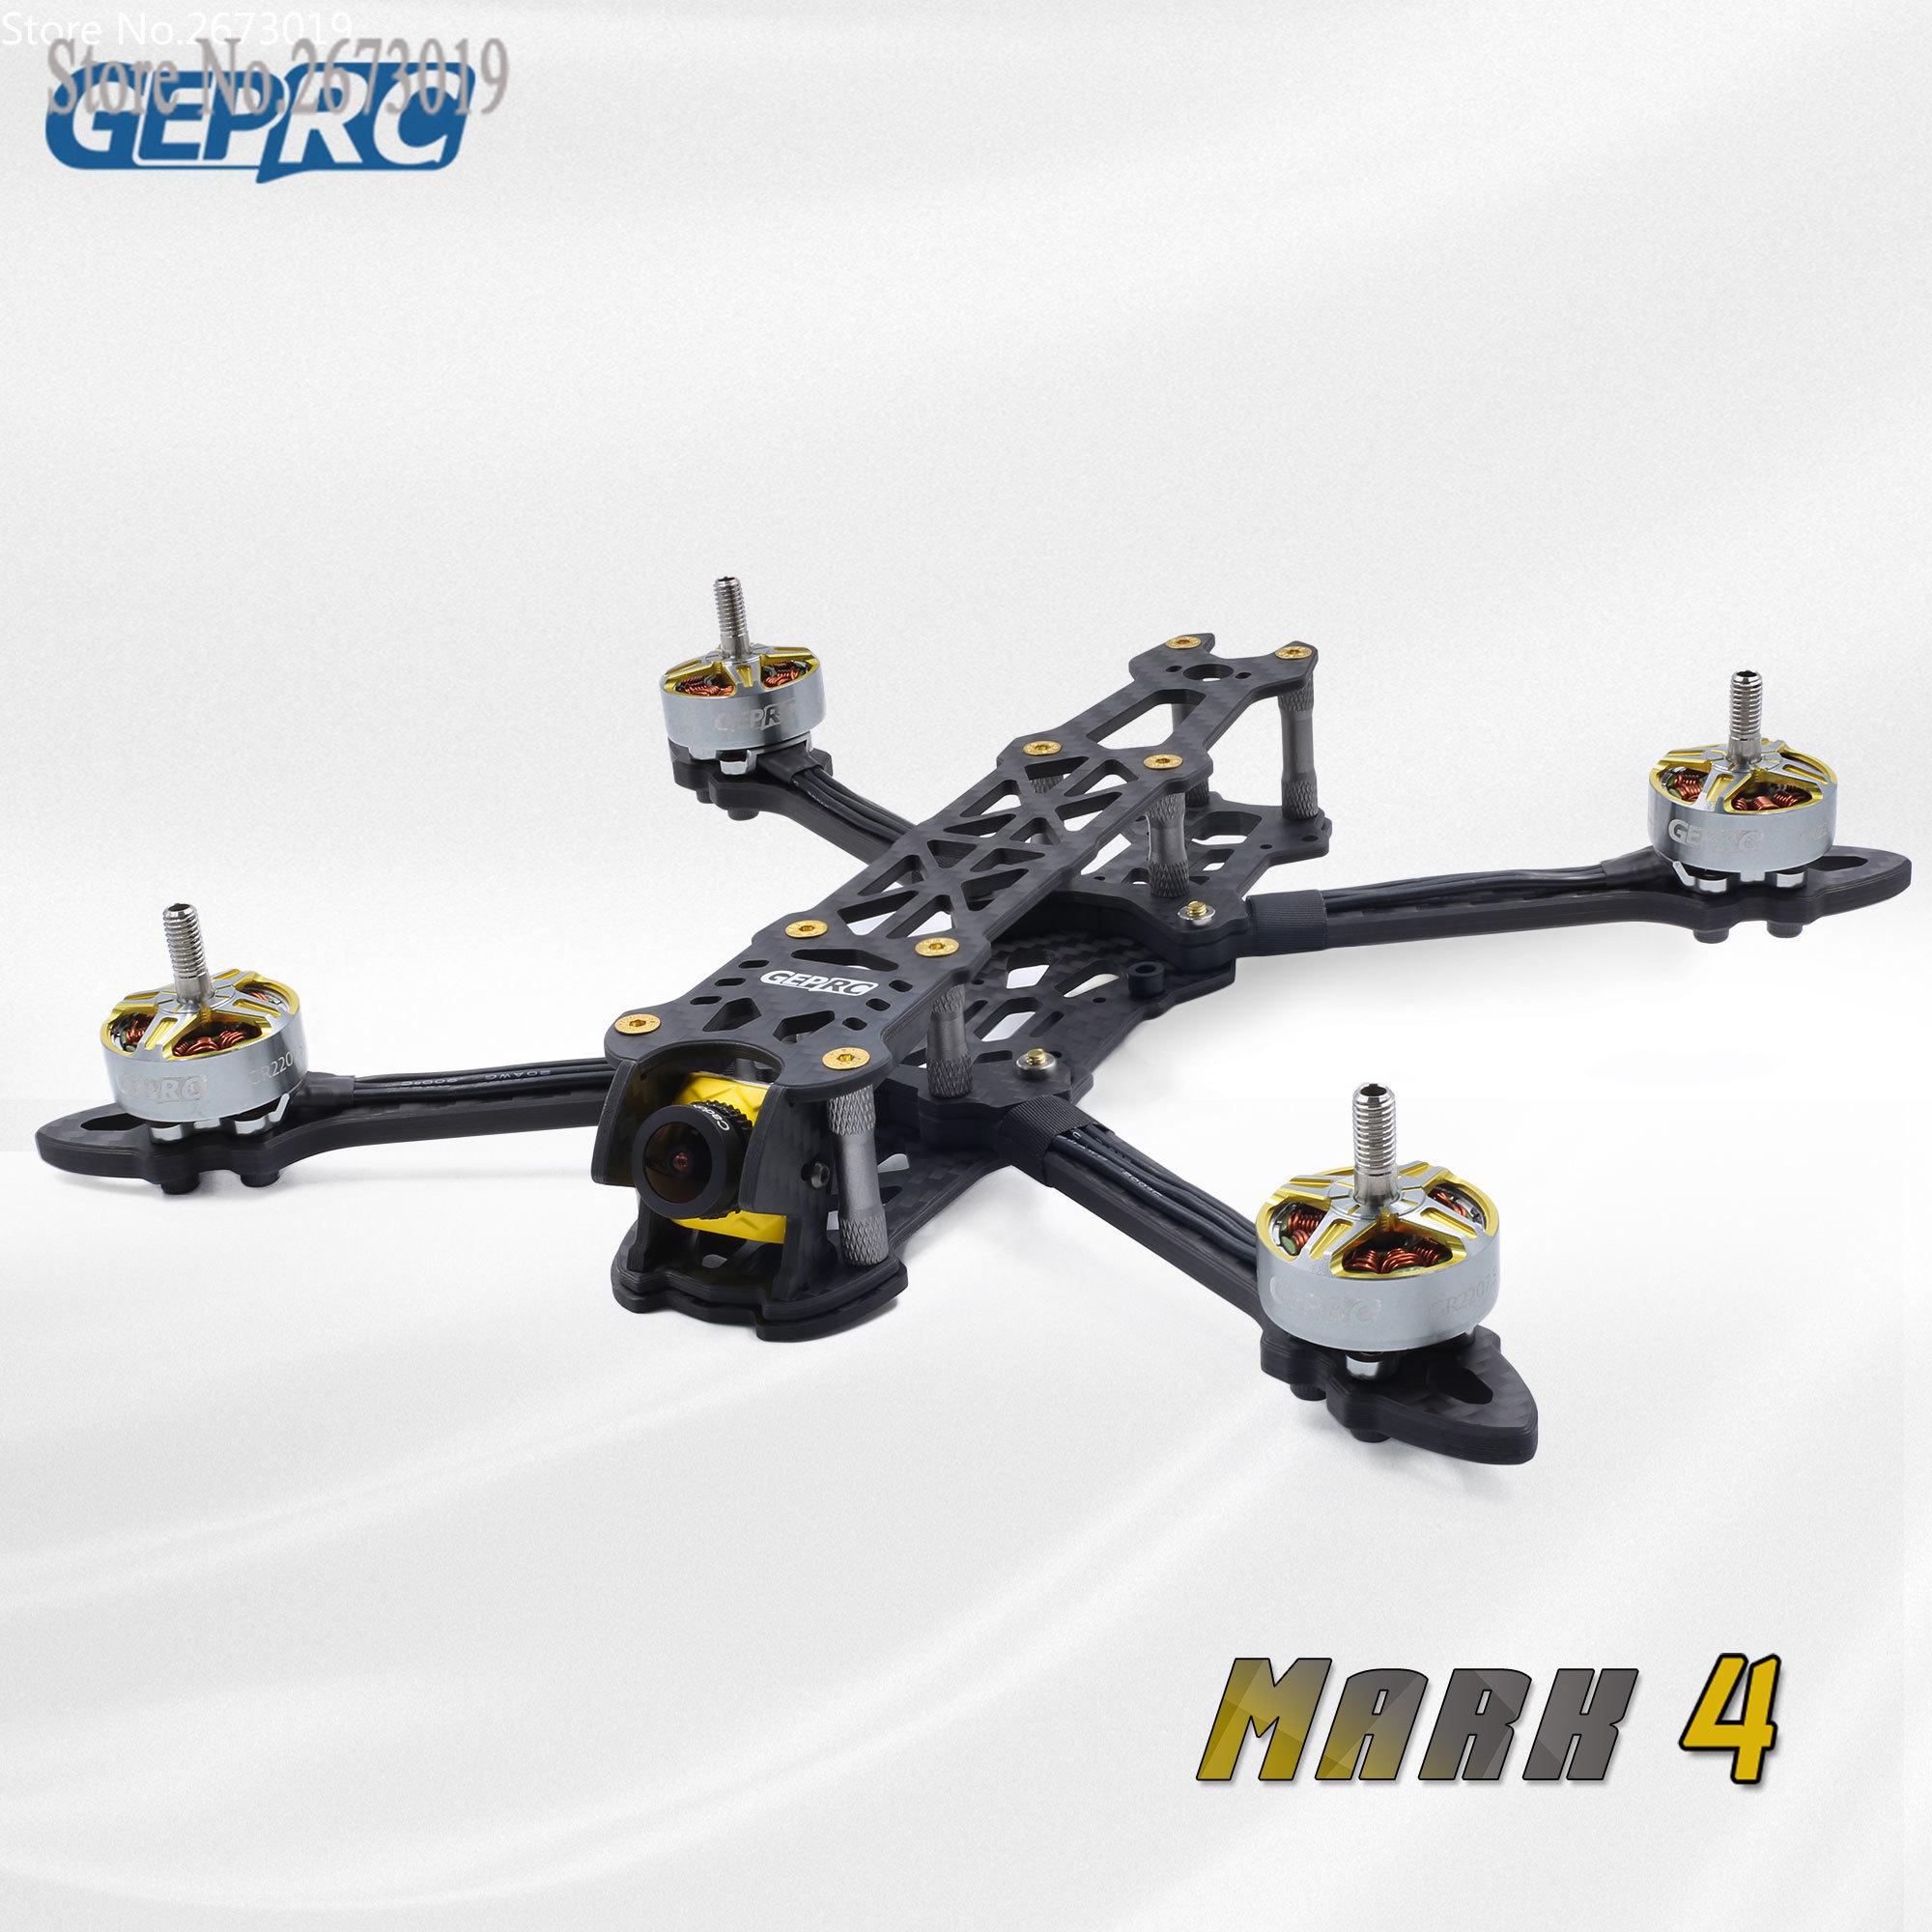 GEPRC Mark 4 FPV Racing Drone Rahmen Kit 5 ''/6''/7 ''Qudcopter Rahmen 5mm arm mit 30,5*30,5/20*20mm montage löcher für FC